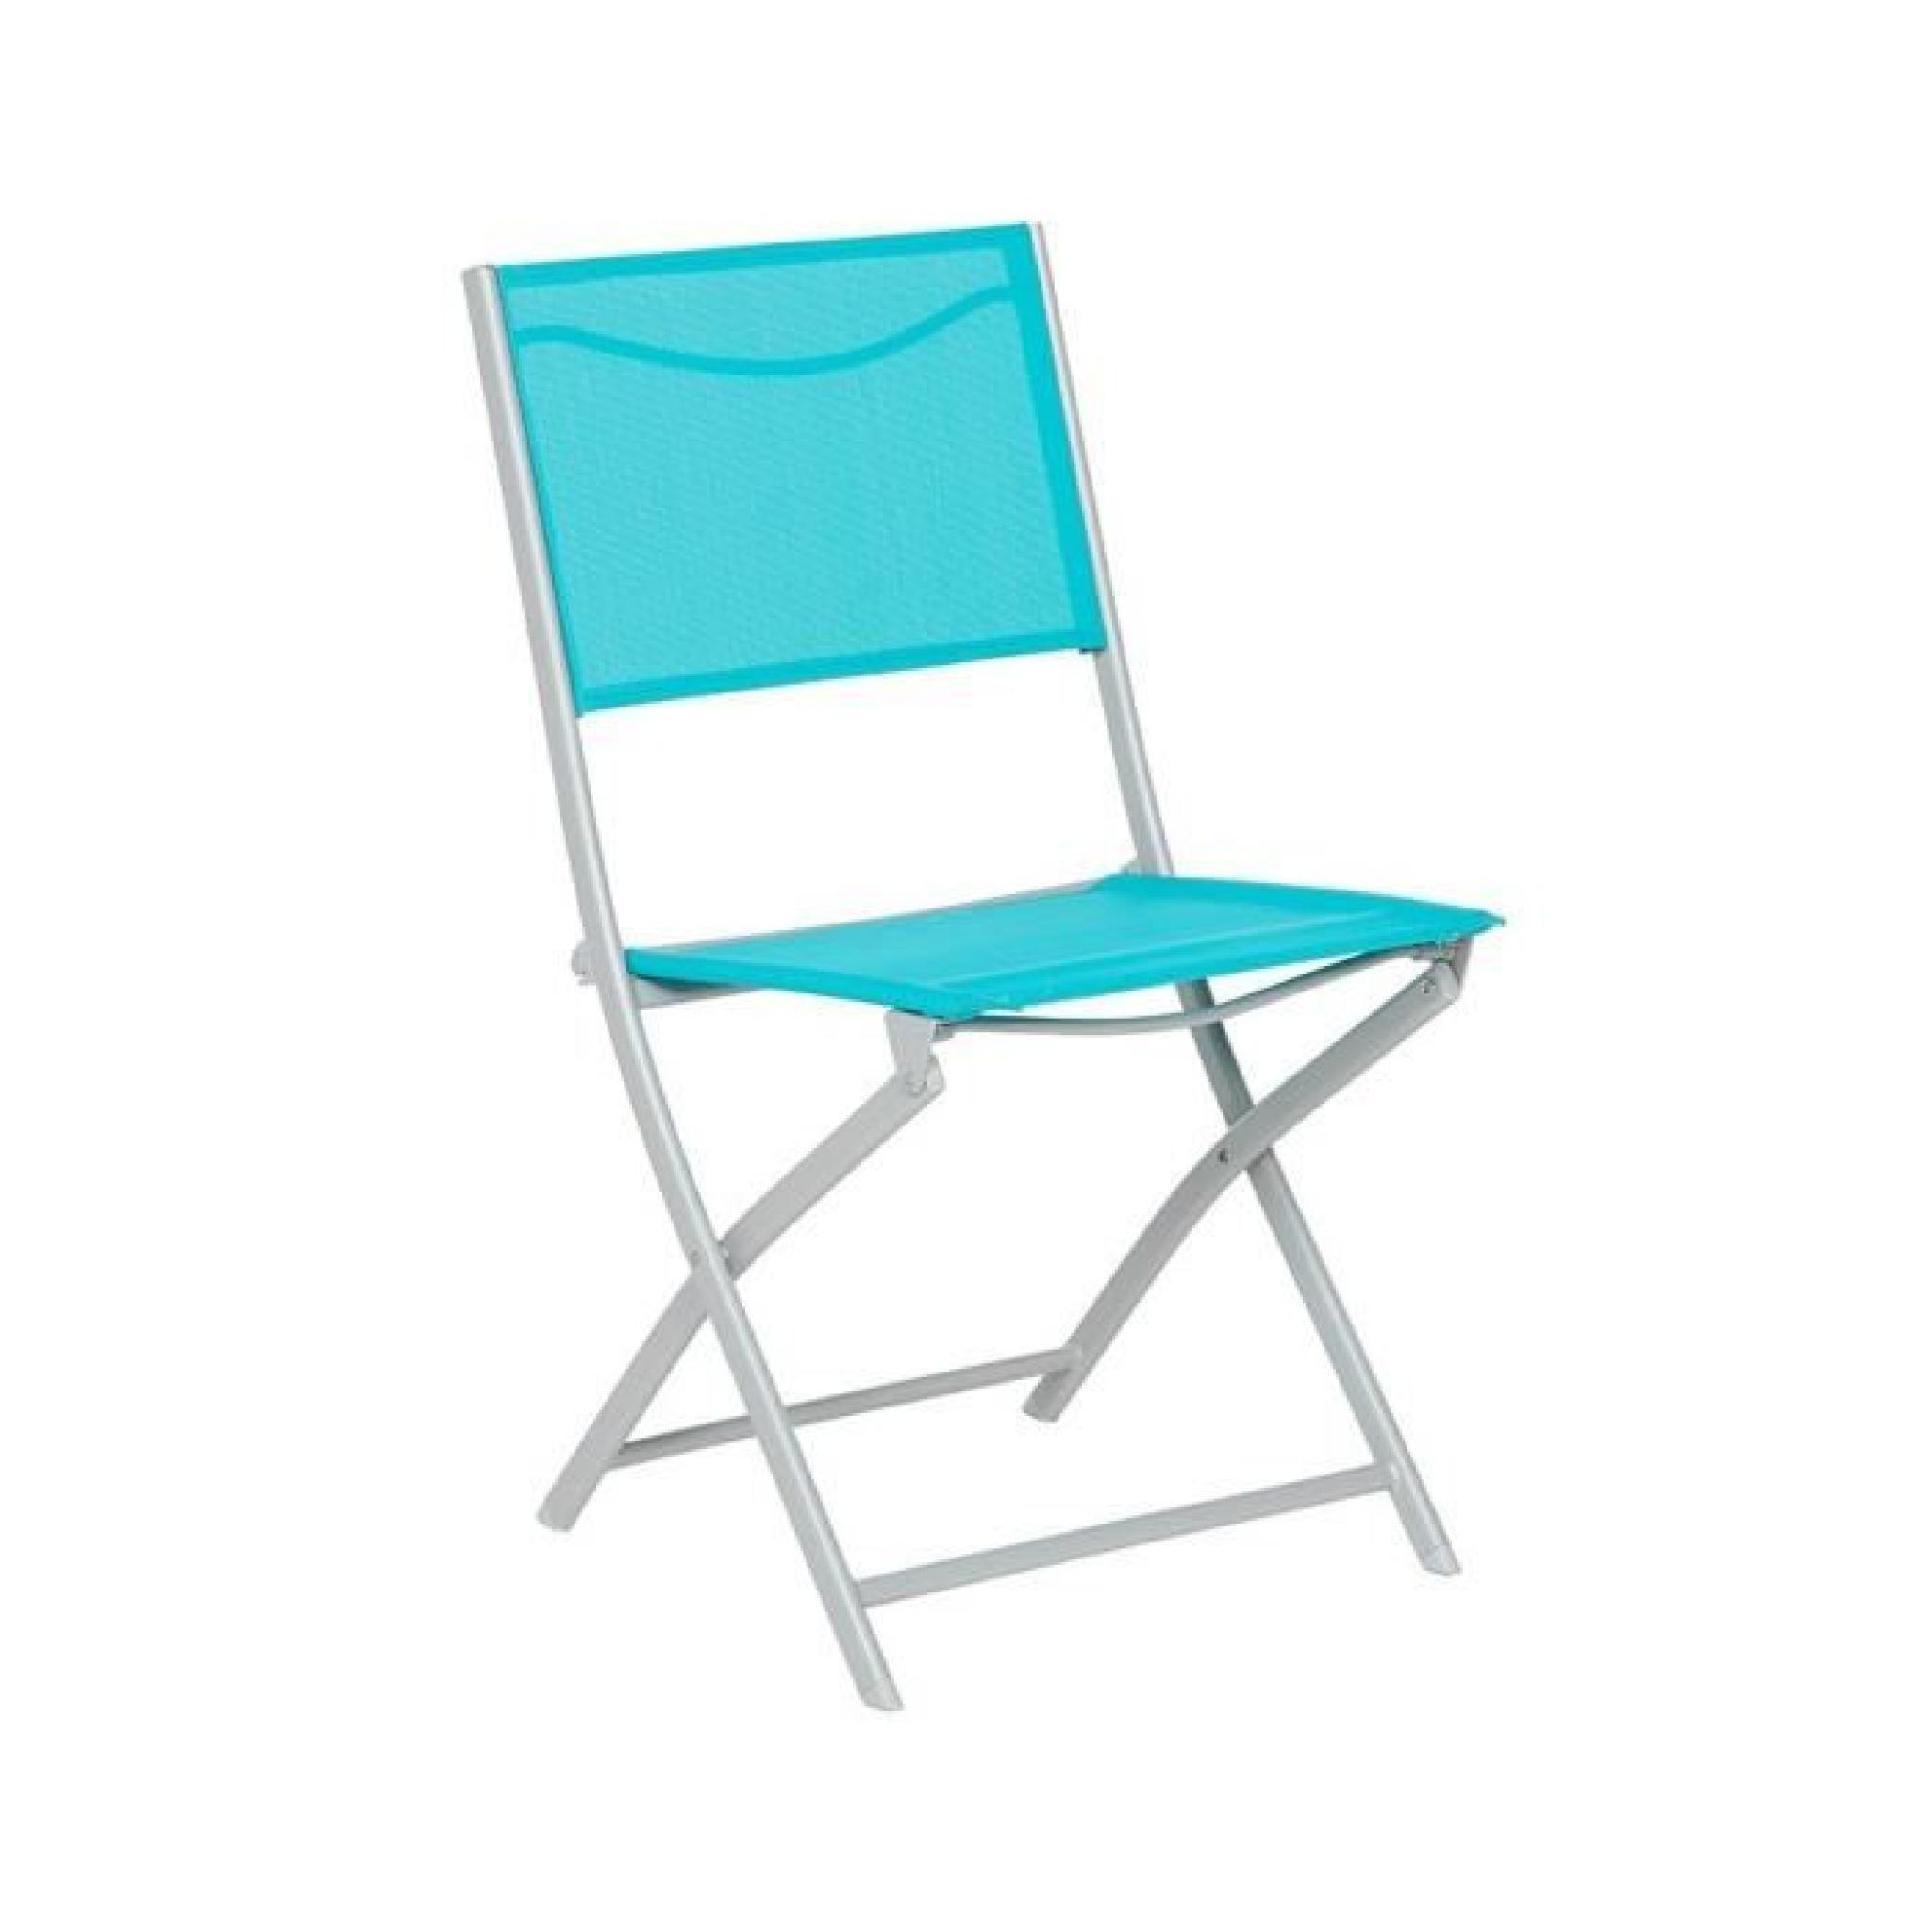 Chaise Pliante Hespéride Modula Bleu Lagon/Silver Mat destiné Chaise De Jardin Hesperide